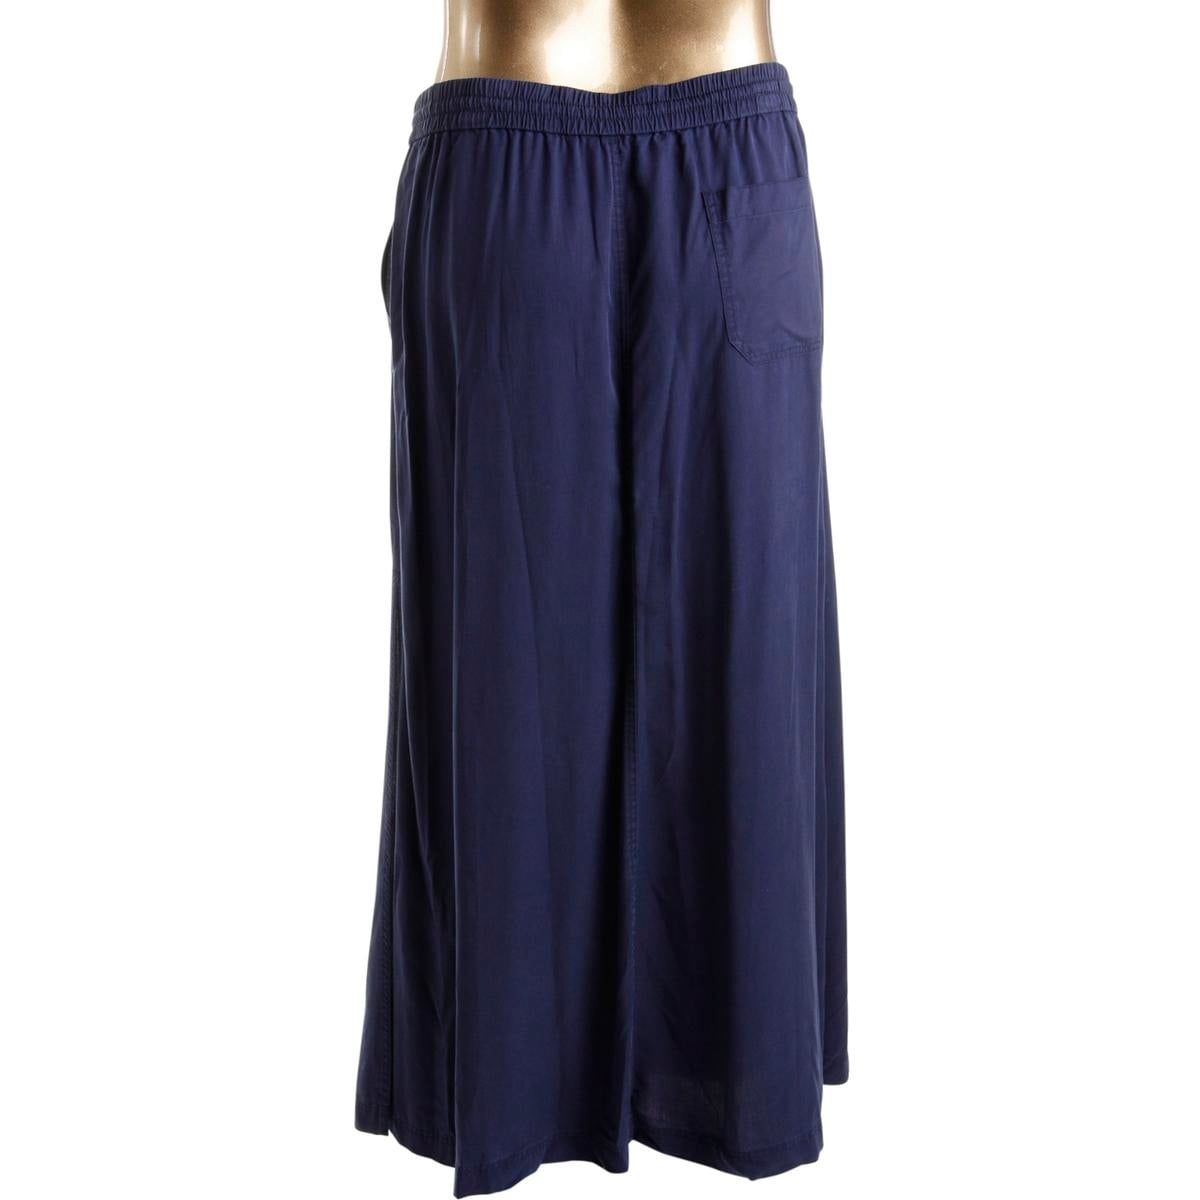 ee9b07839a Shop Lauren Ralph Lauren Womens Maxi Skirt Side Split Pockets - Free  Shipping On Orders Over $45 - Overstock - 14543529